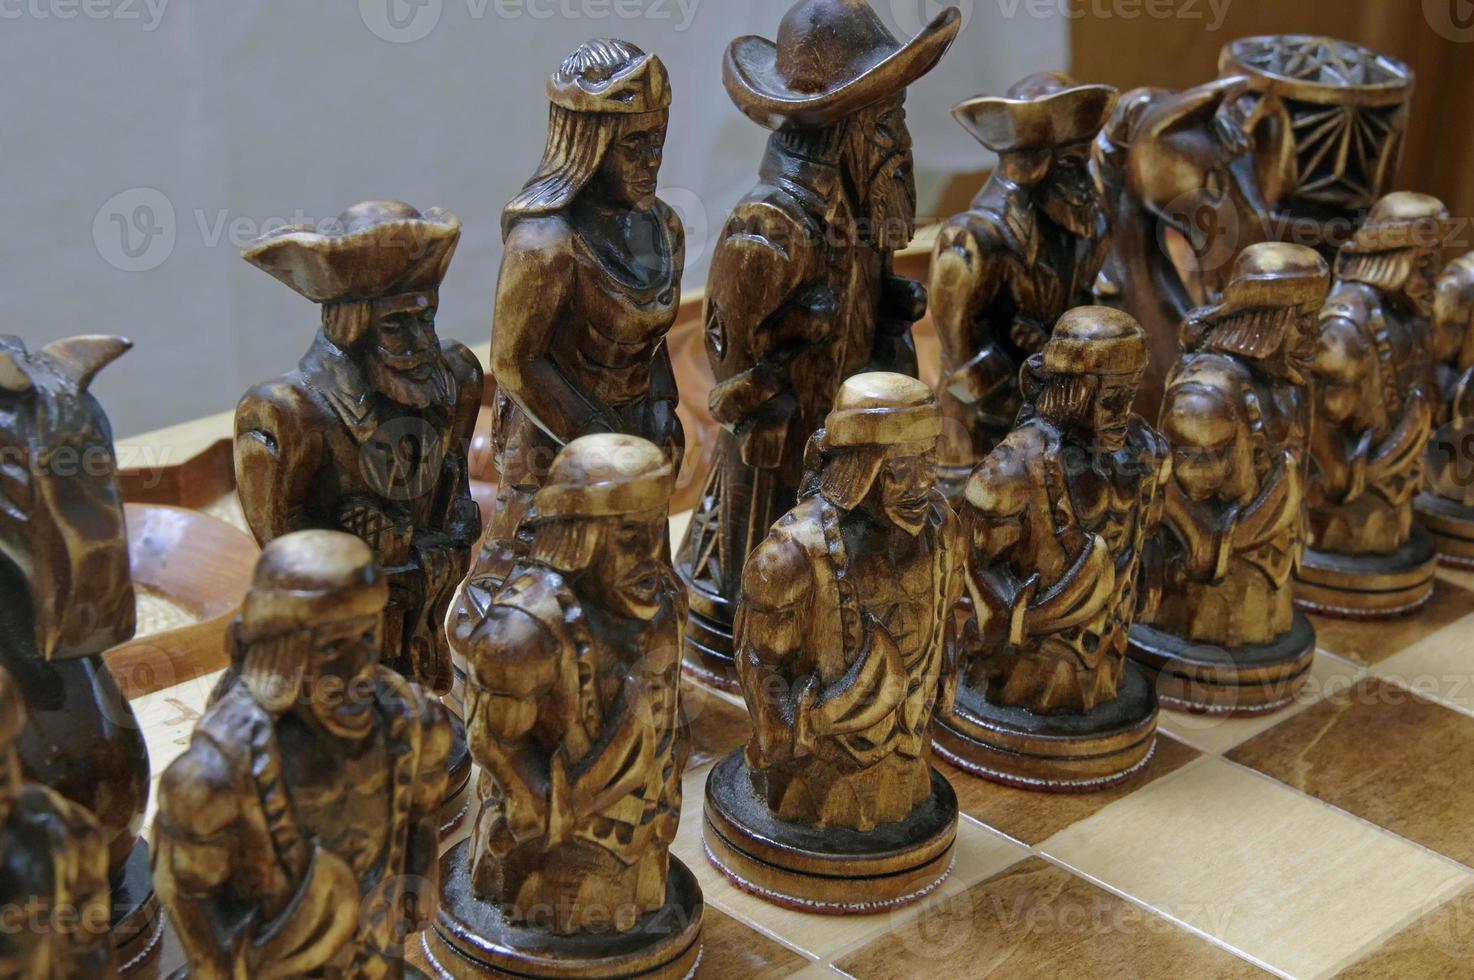 schackfigurer ombord foto